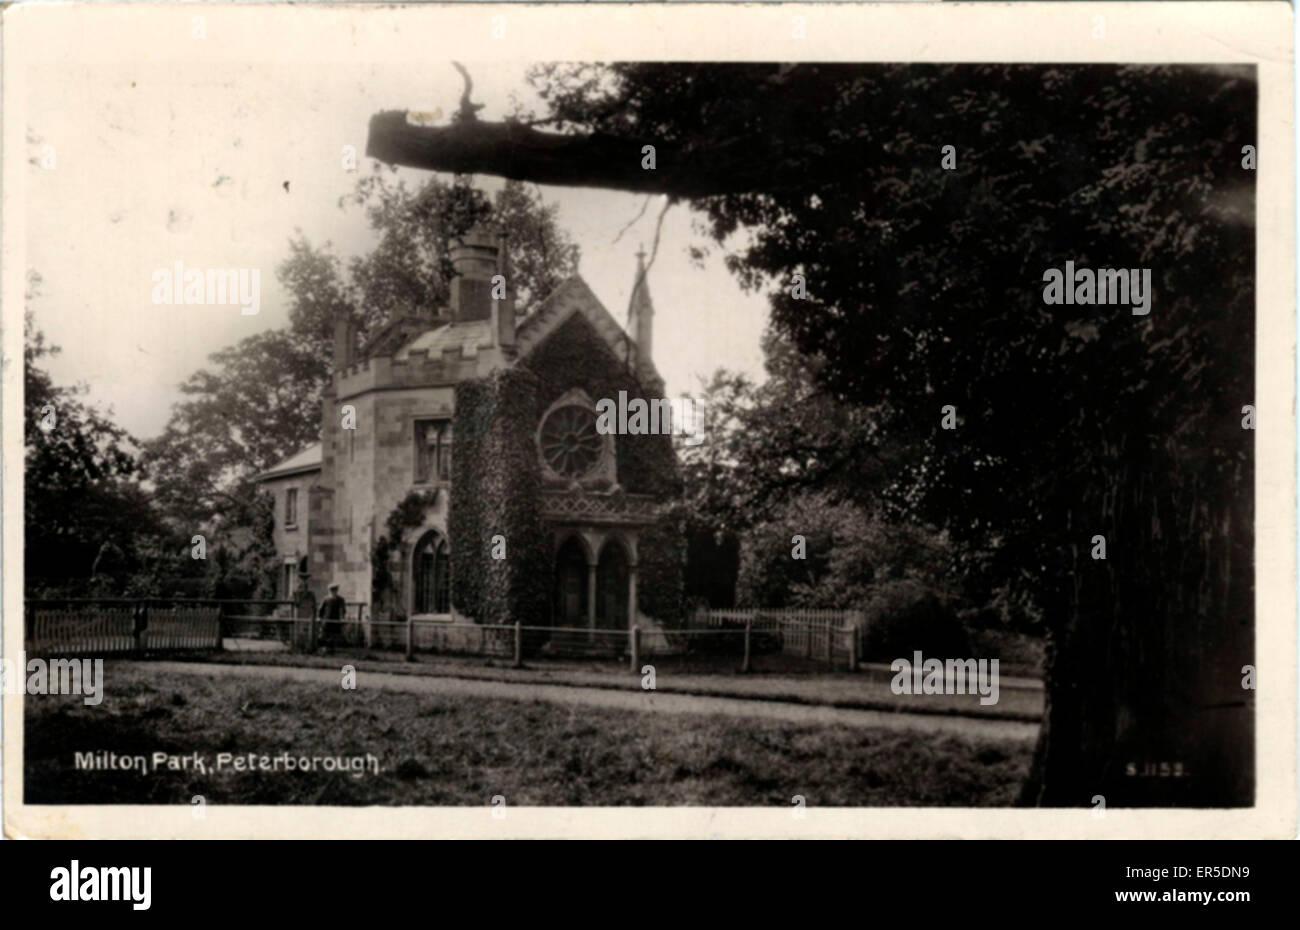 Milton Park, Peterborough, Cambridgeshire, England.  1910s - Stock Image